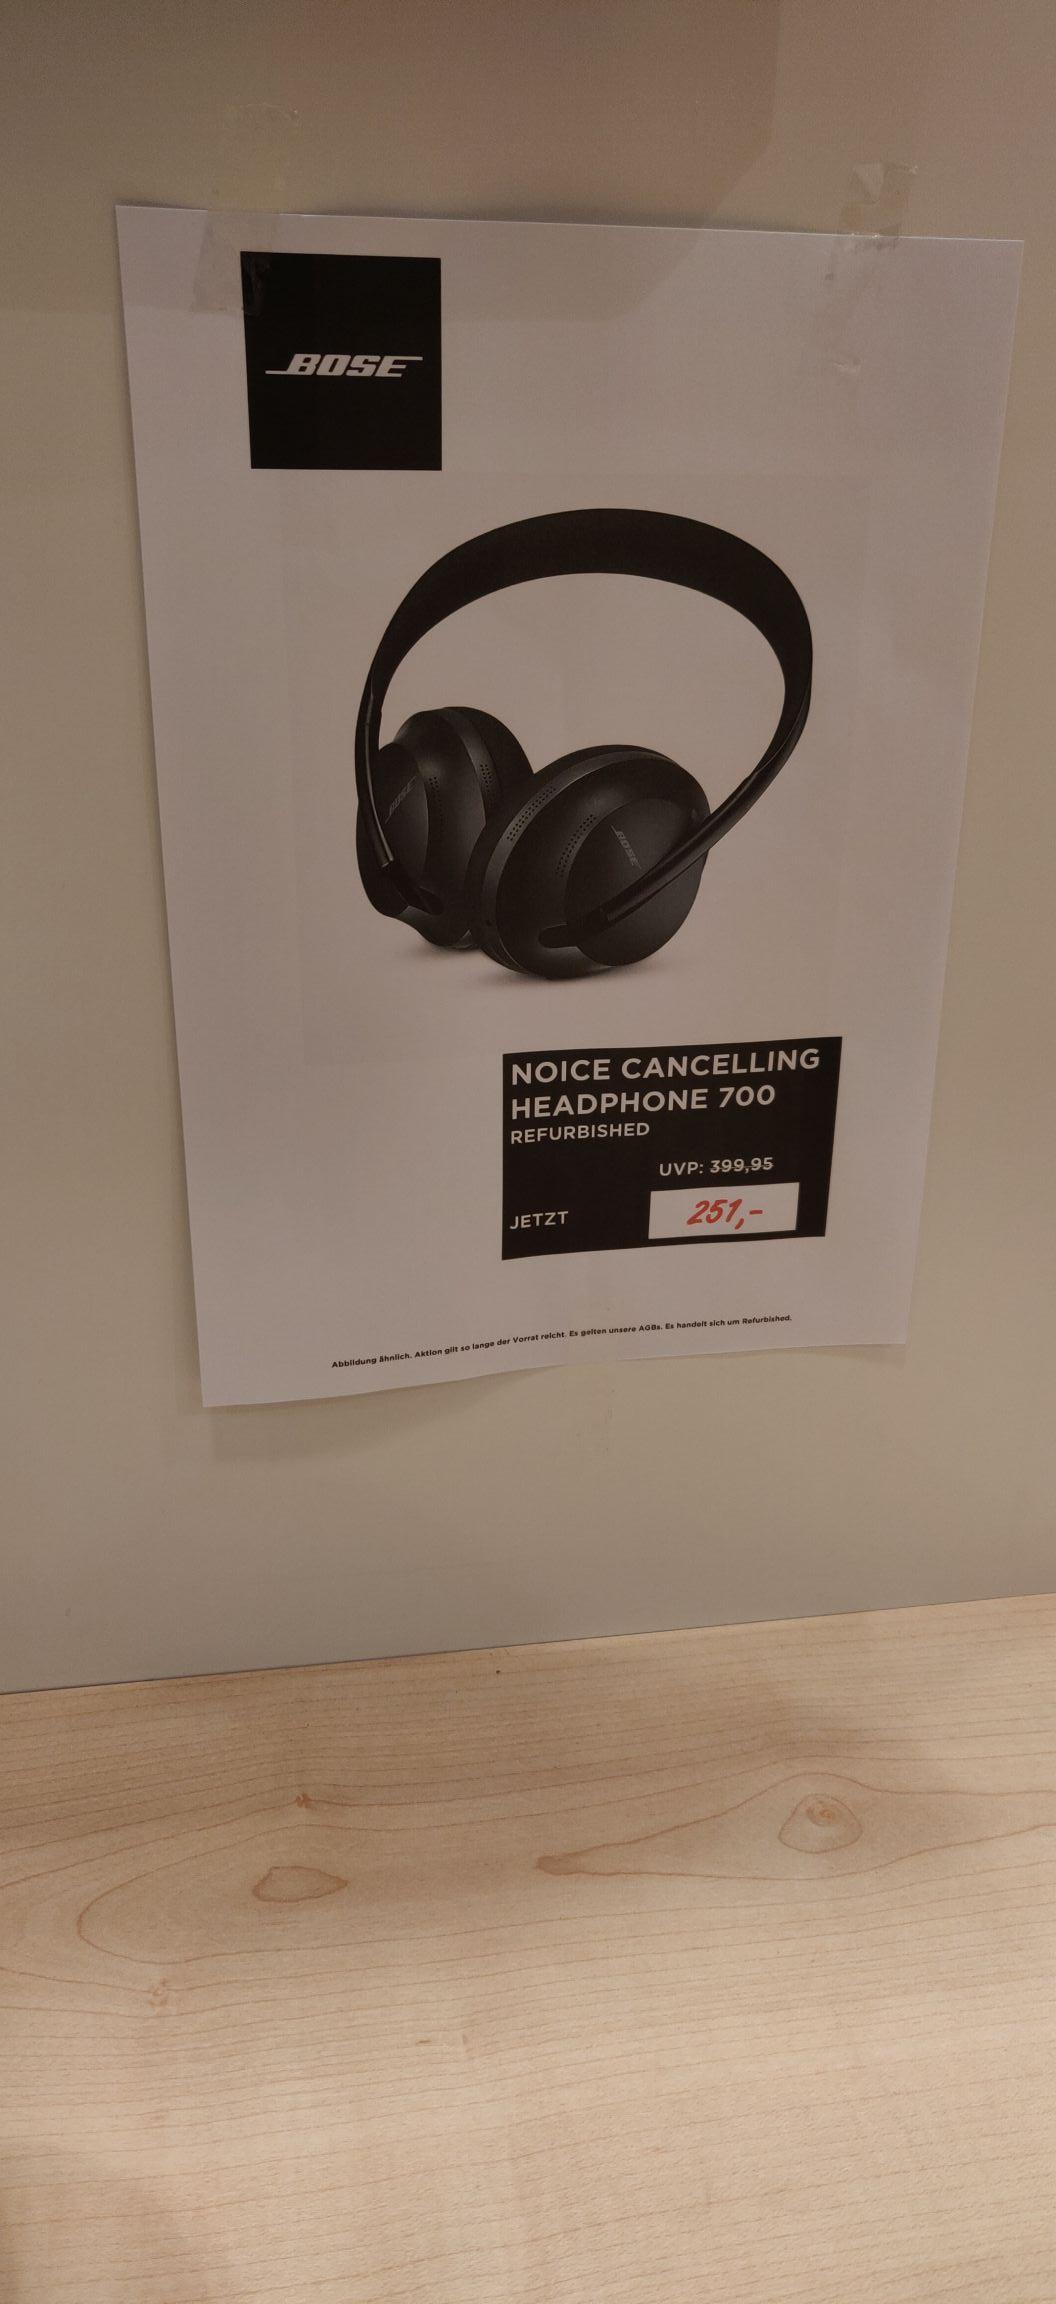 (REFURBISHED) Bose noise cancelling headphones 700